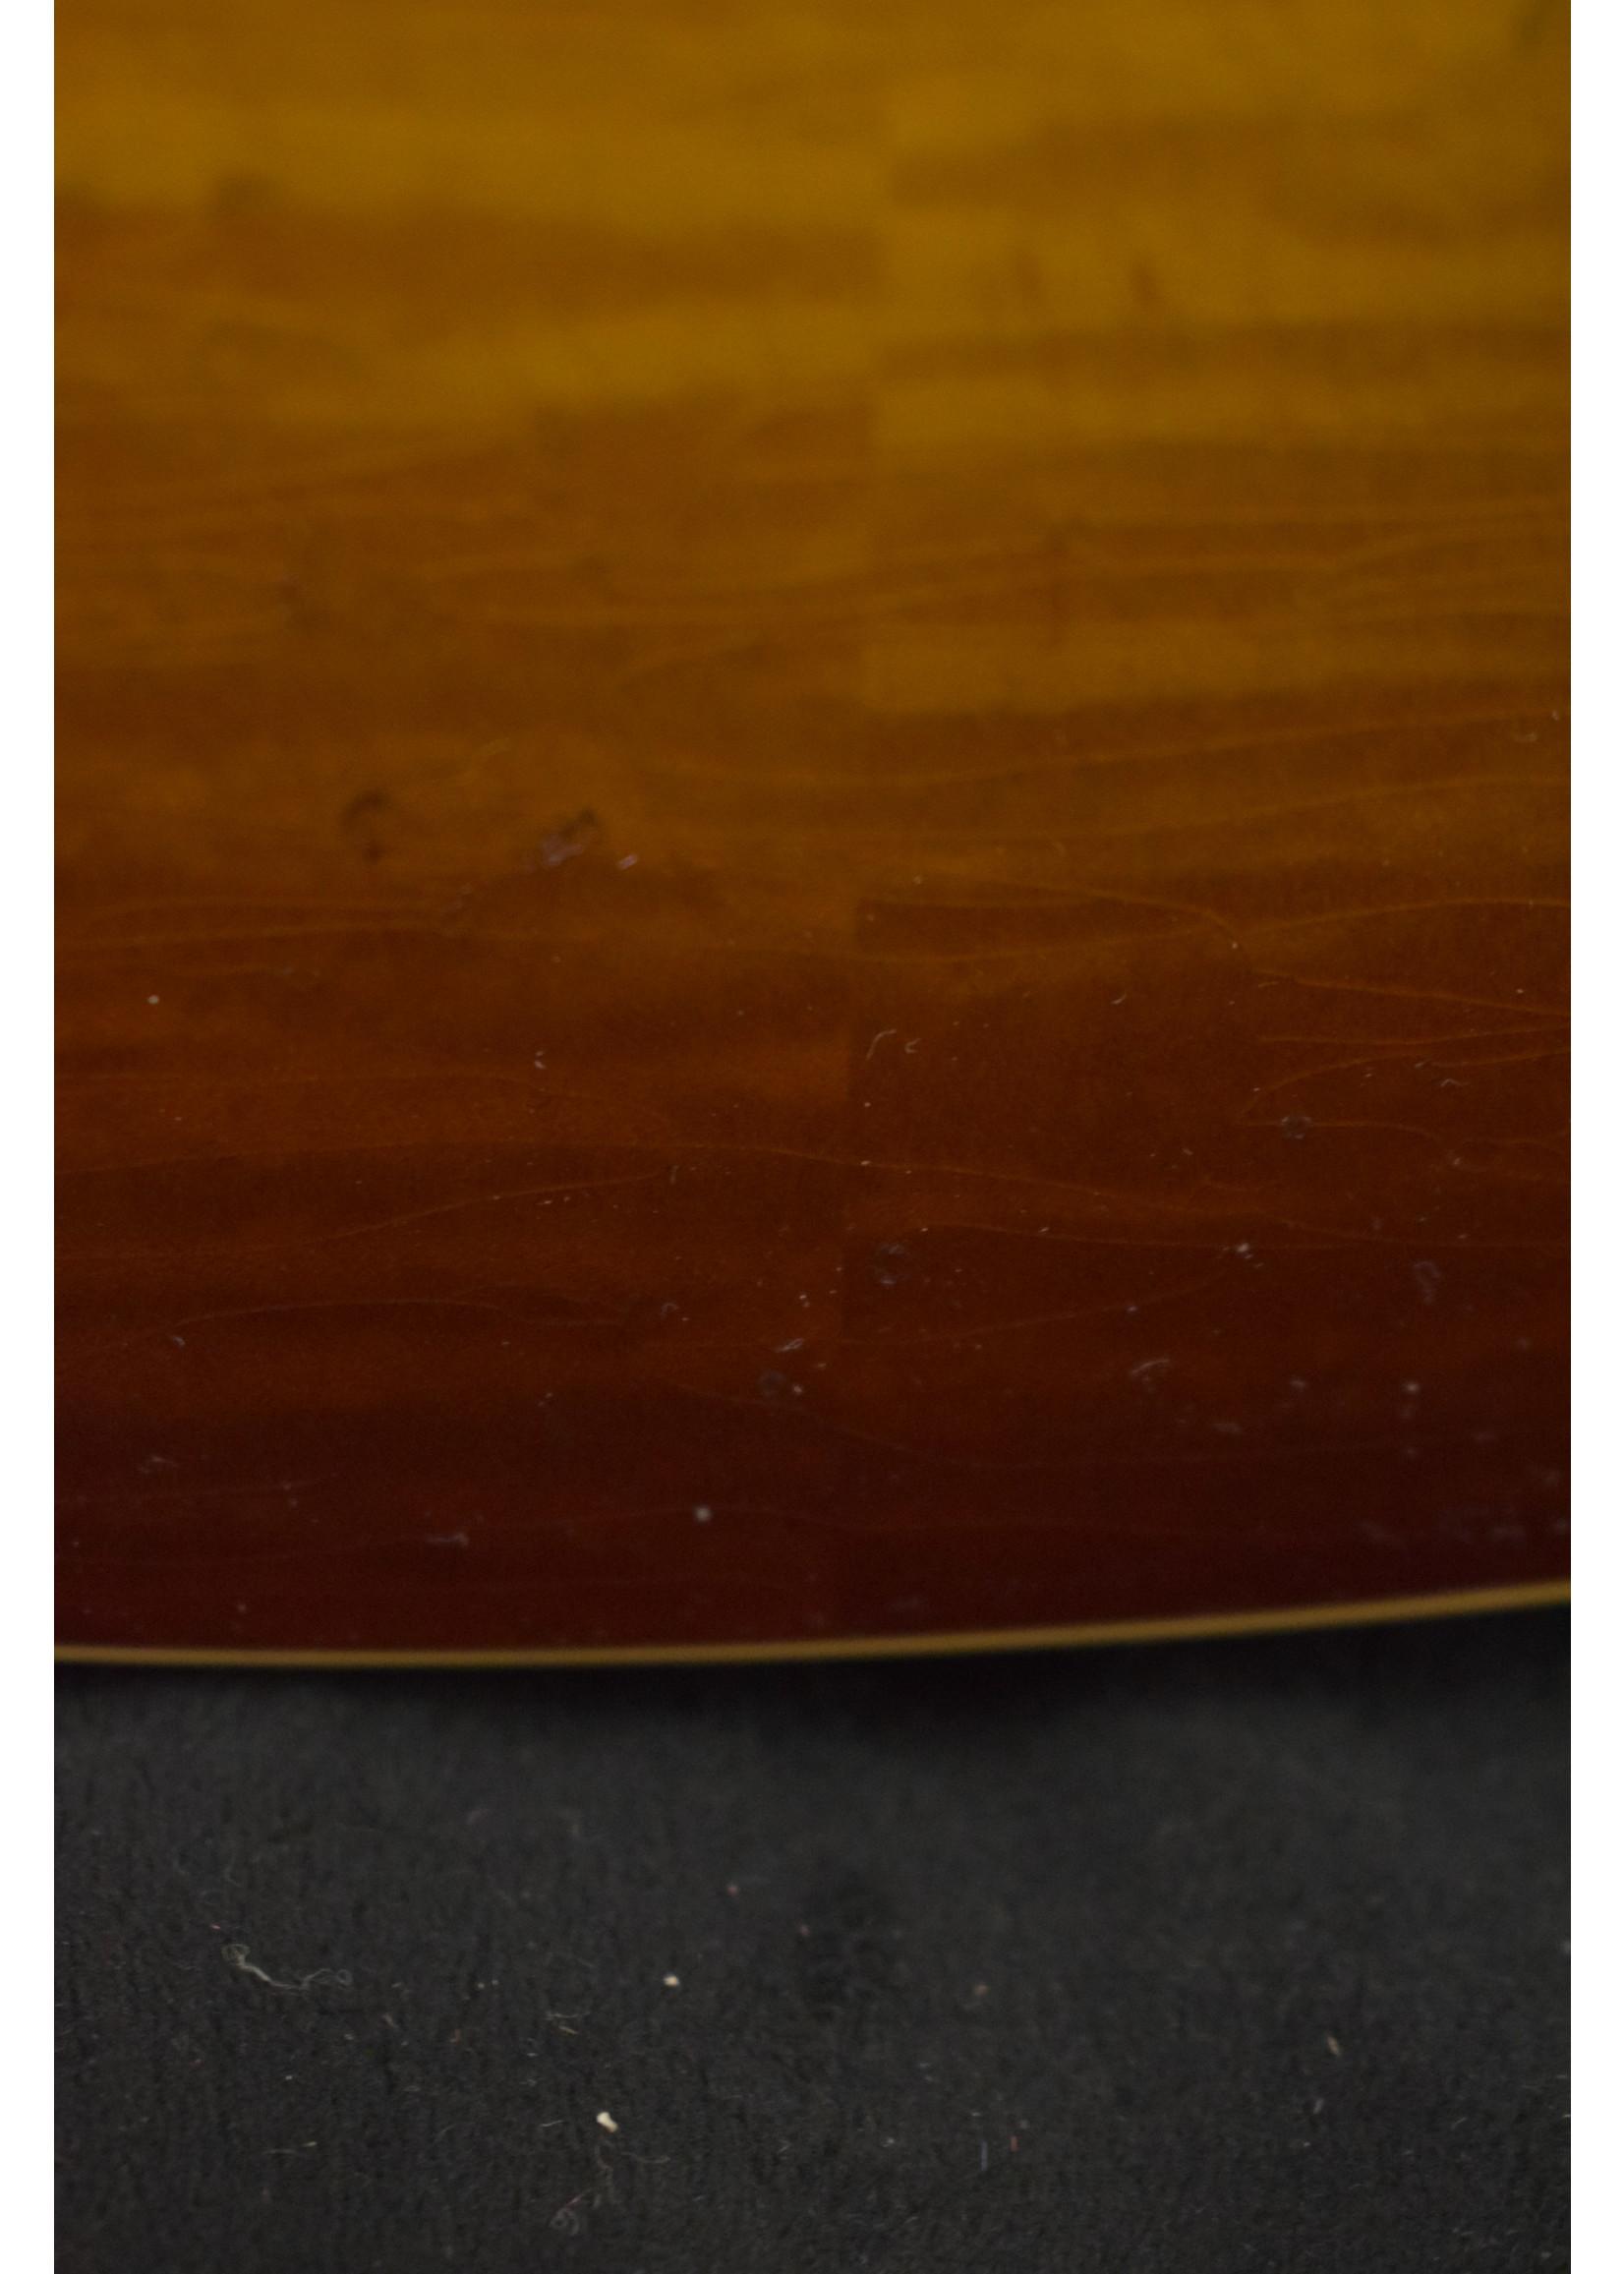 Gibson Gibson Murphy Lab 1959 Les Paul Standard Royal Tea Burst Light Aged